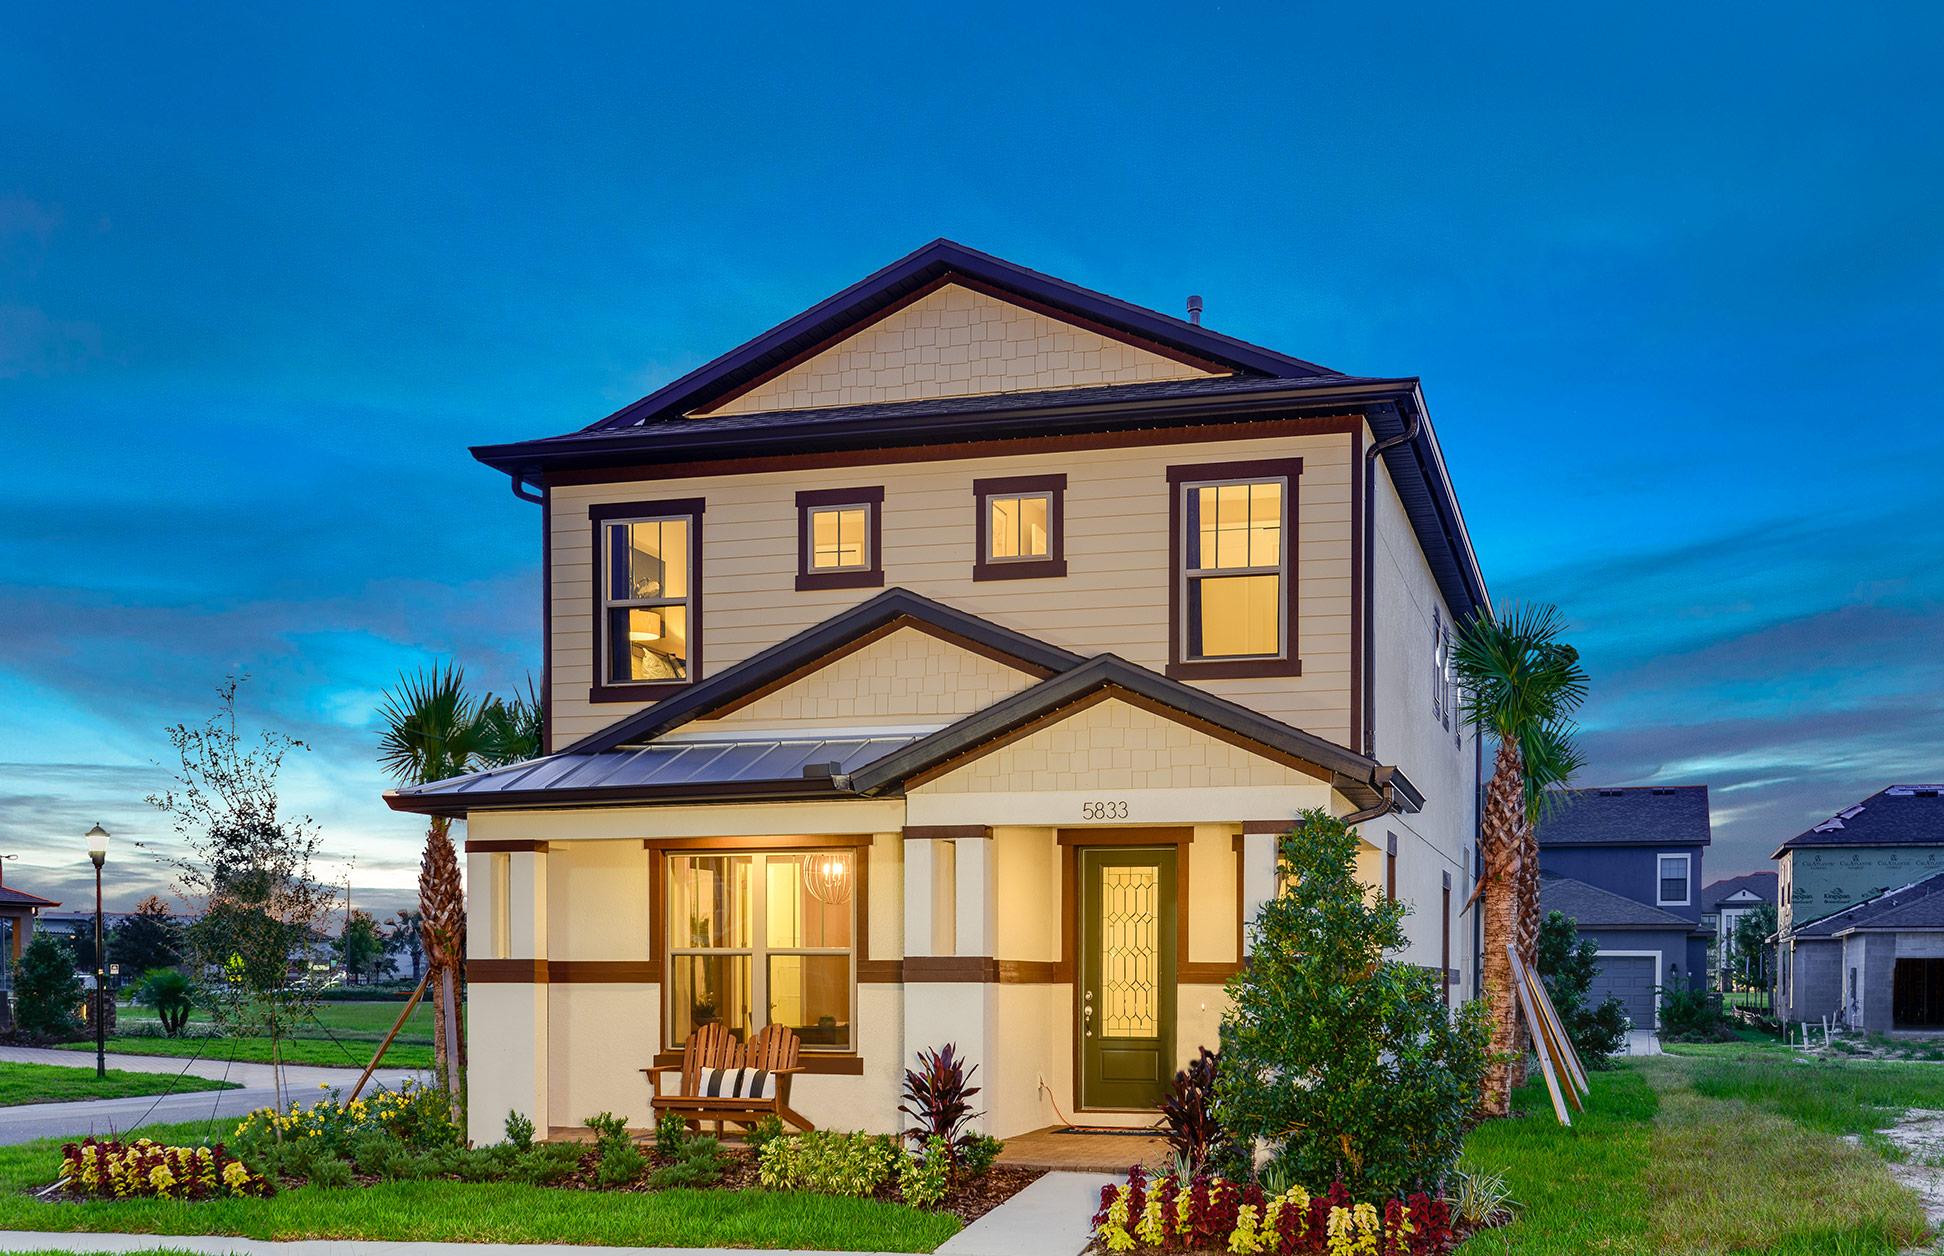 Model Homes Starkey Ranch Tampa Bay Fl